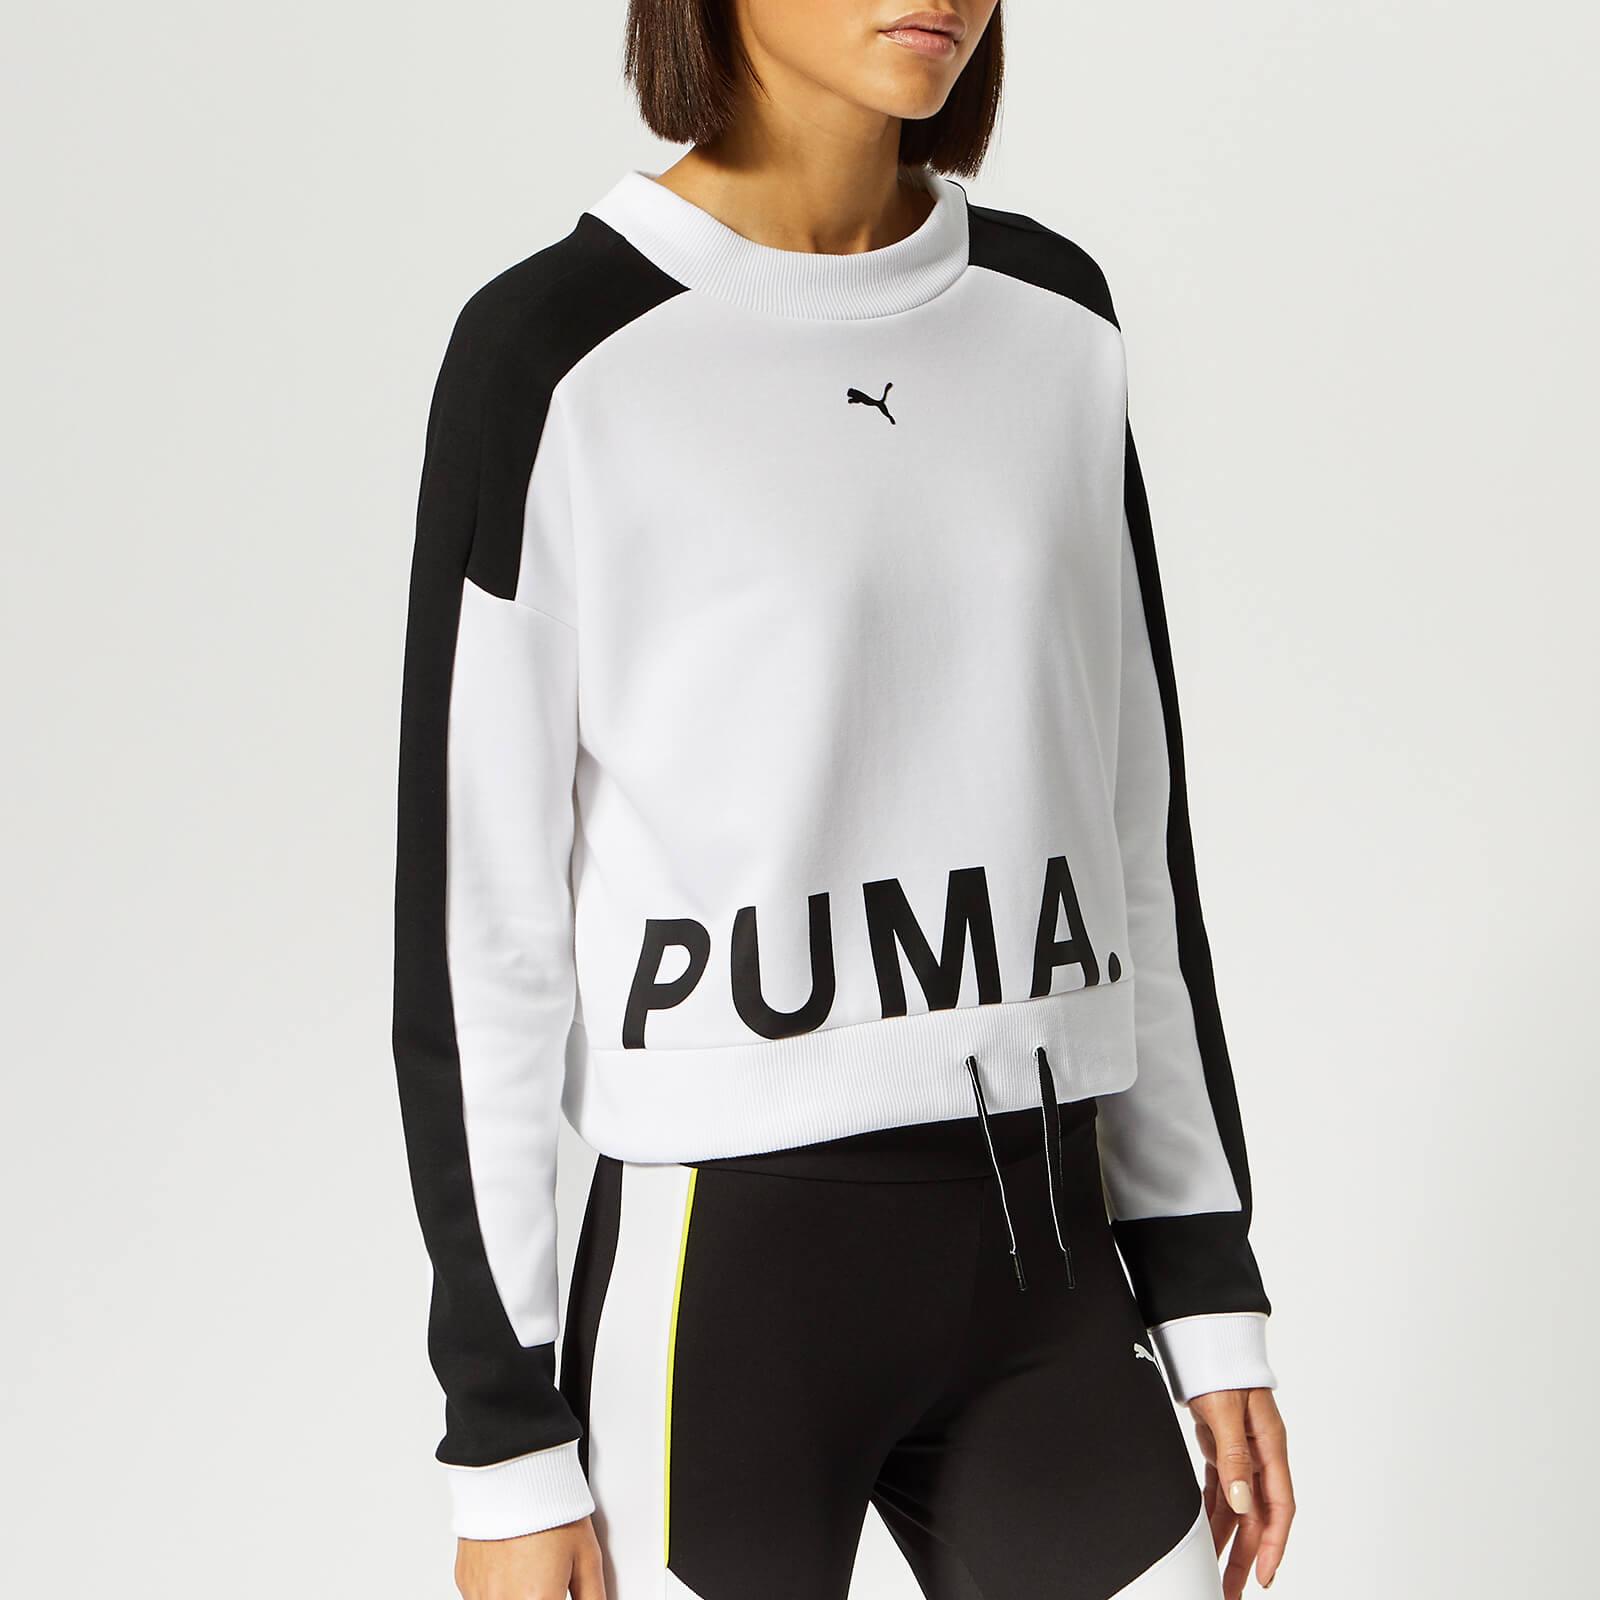 Puma Women's Chase Crew Neck Sweatshirt Puma White Sports